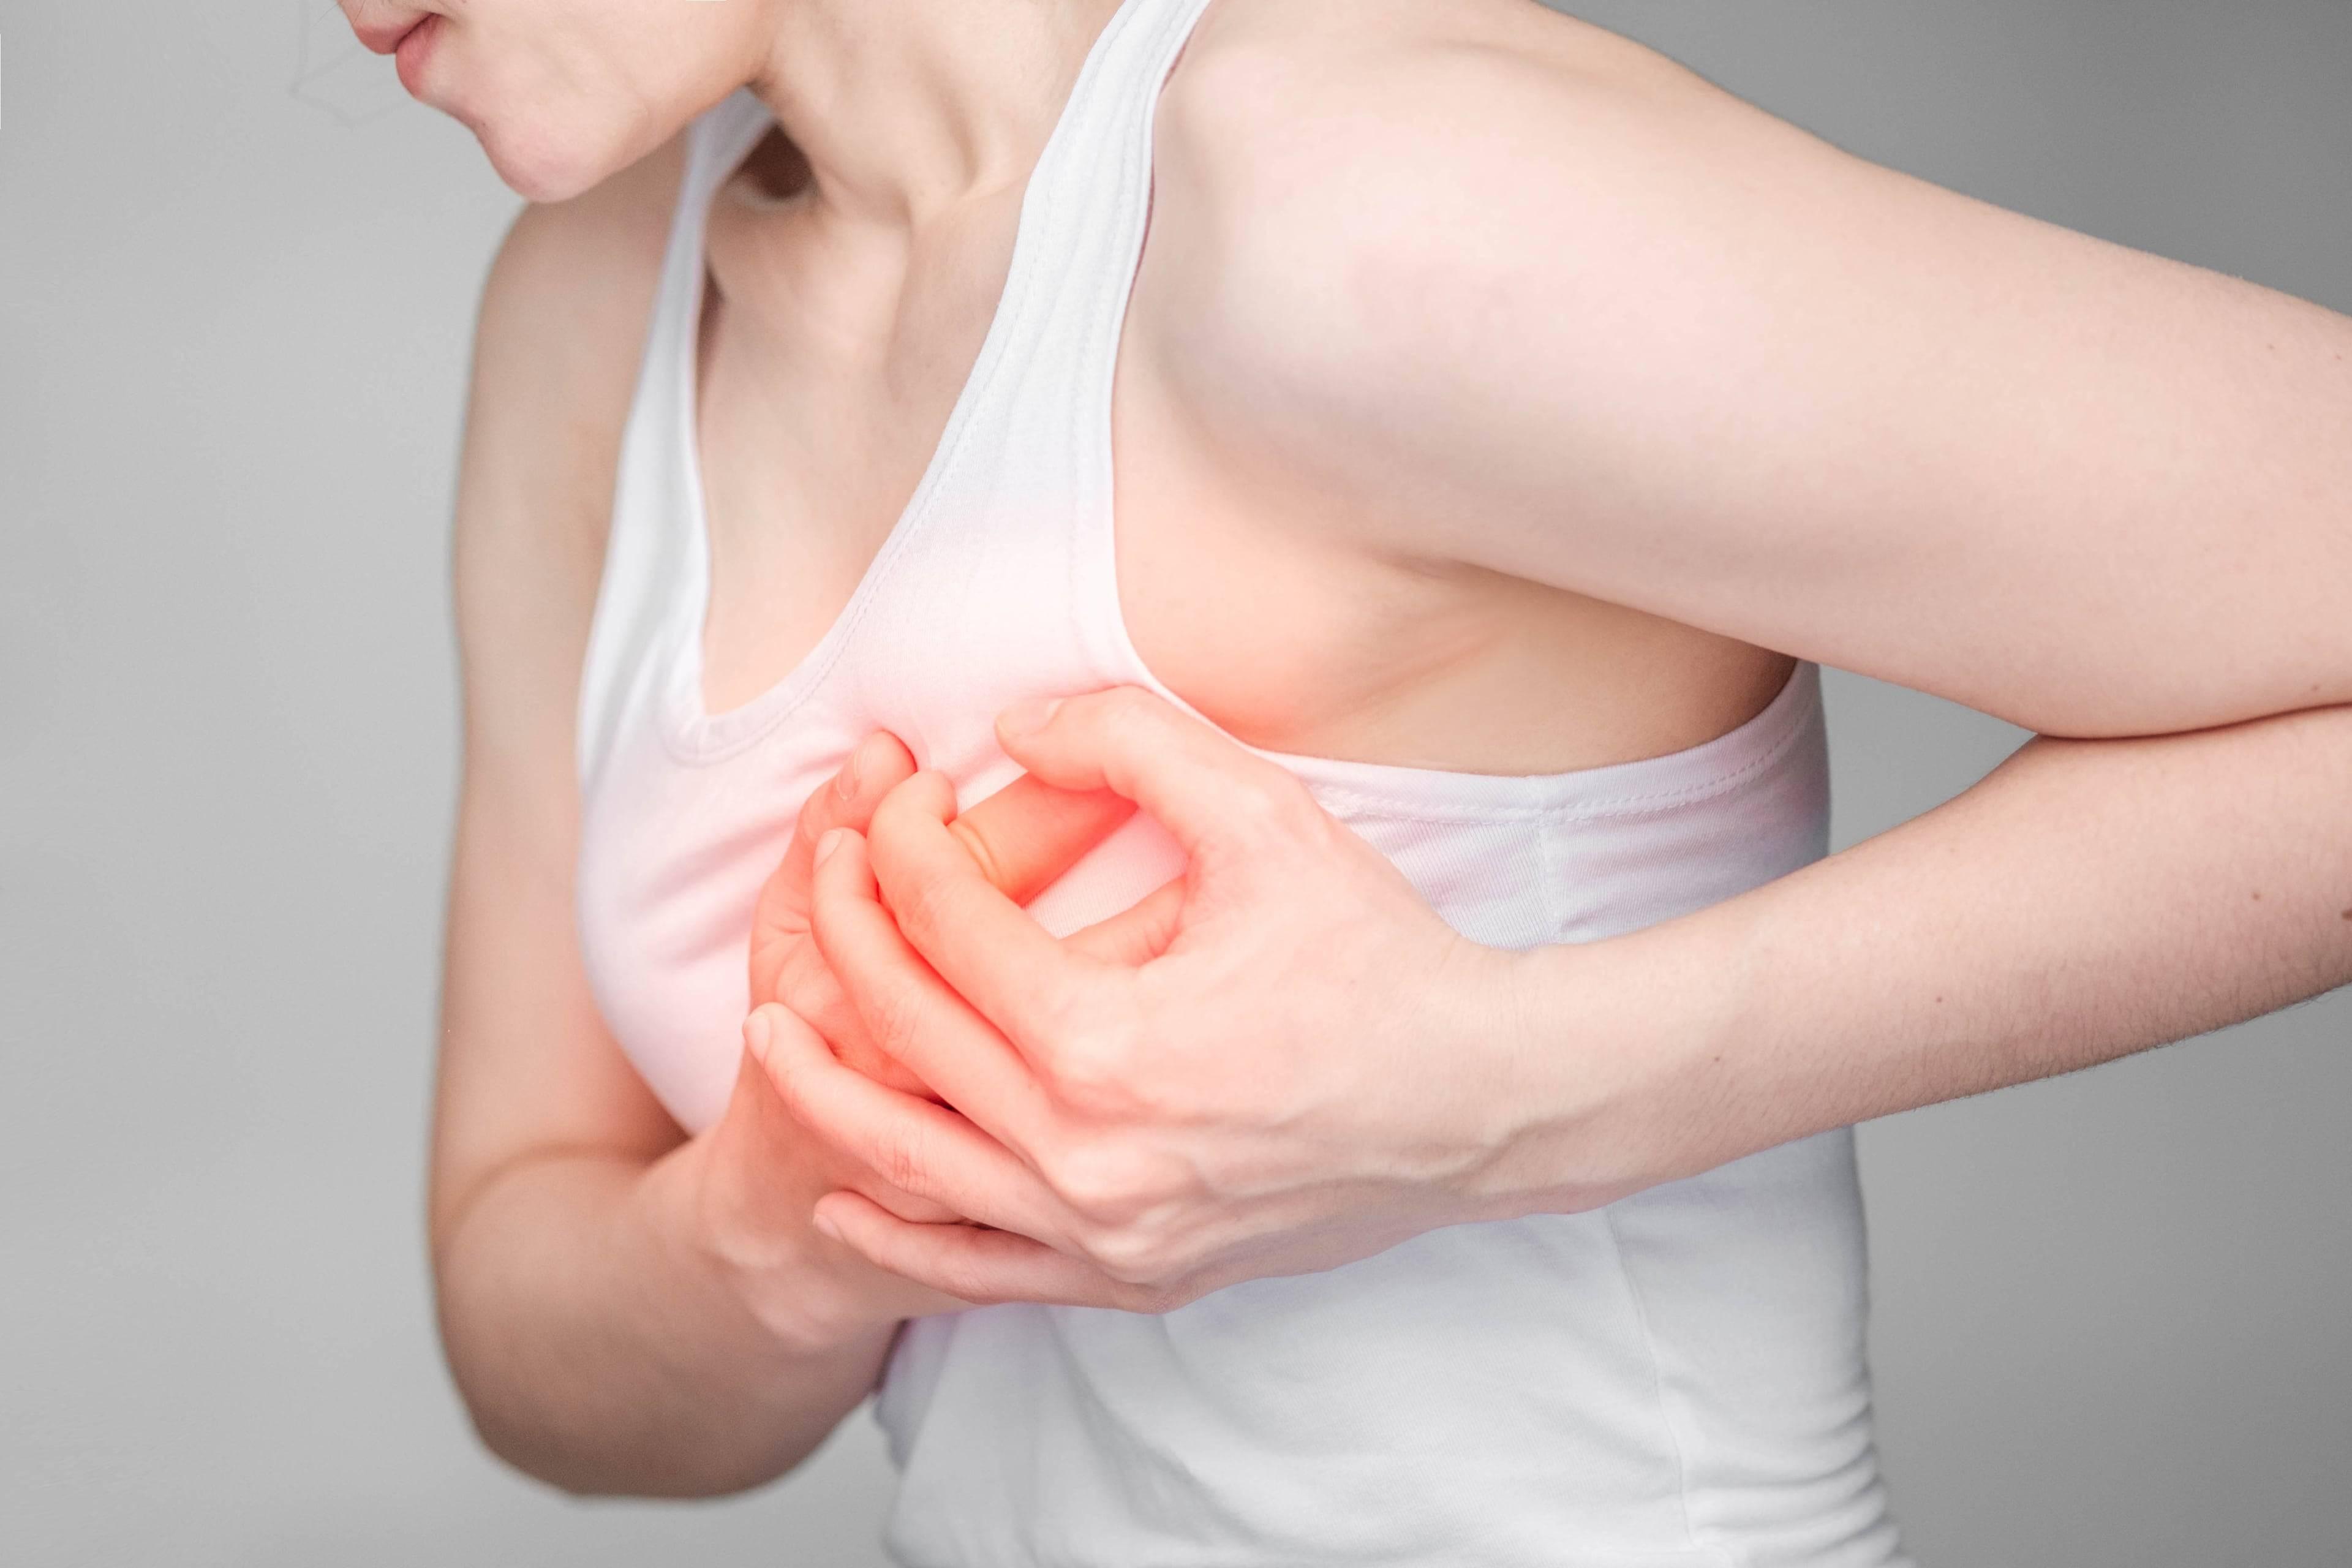 Почему болят грудные железы у женщин